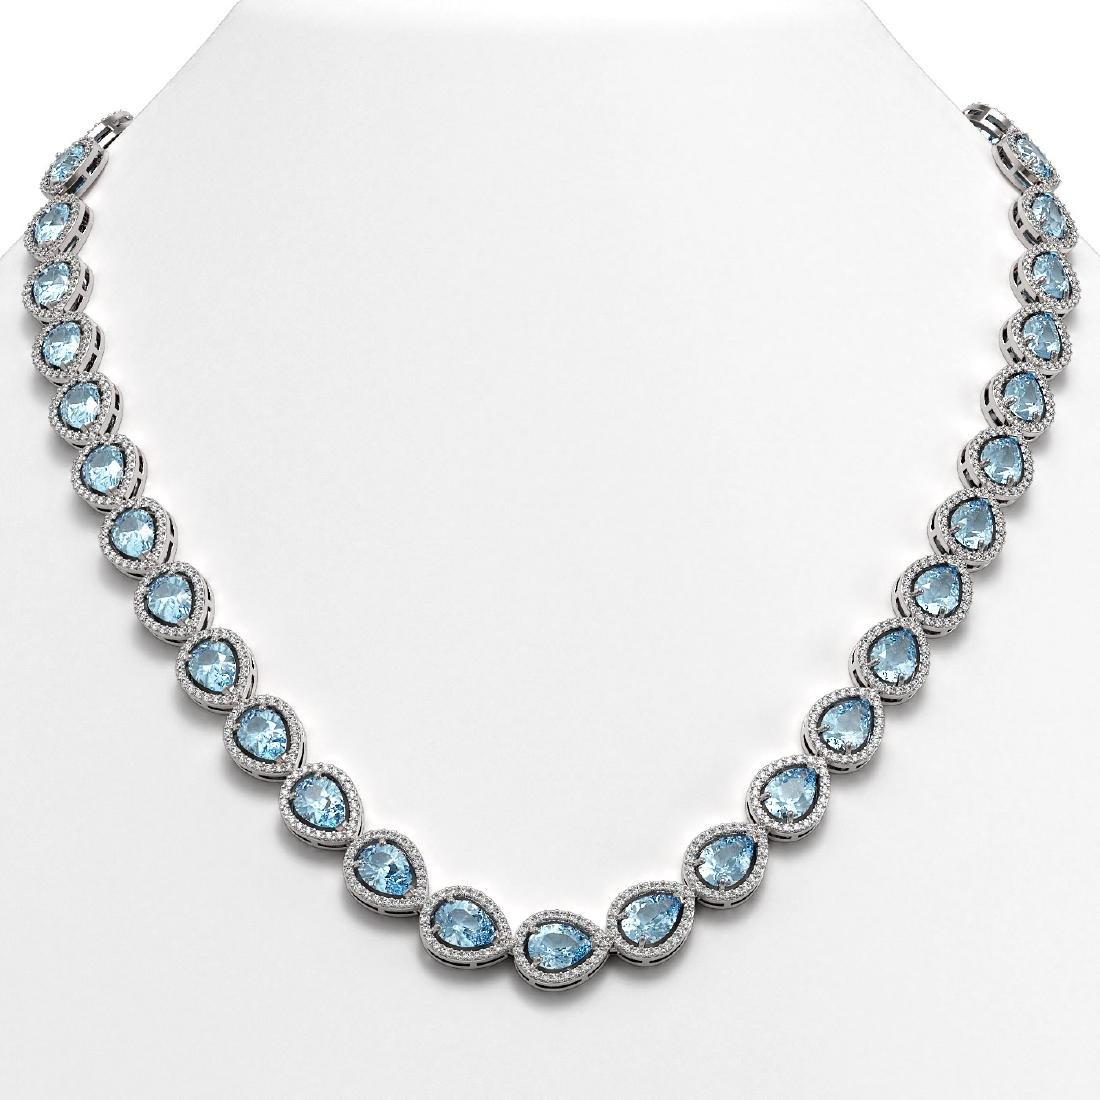 33.35 CTW Aquamarine & Diamond Halo Necklace 10K White